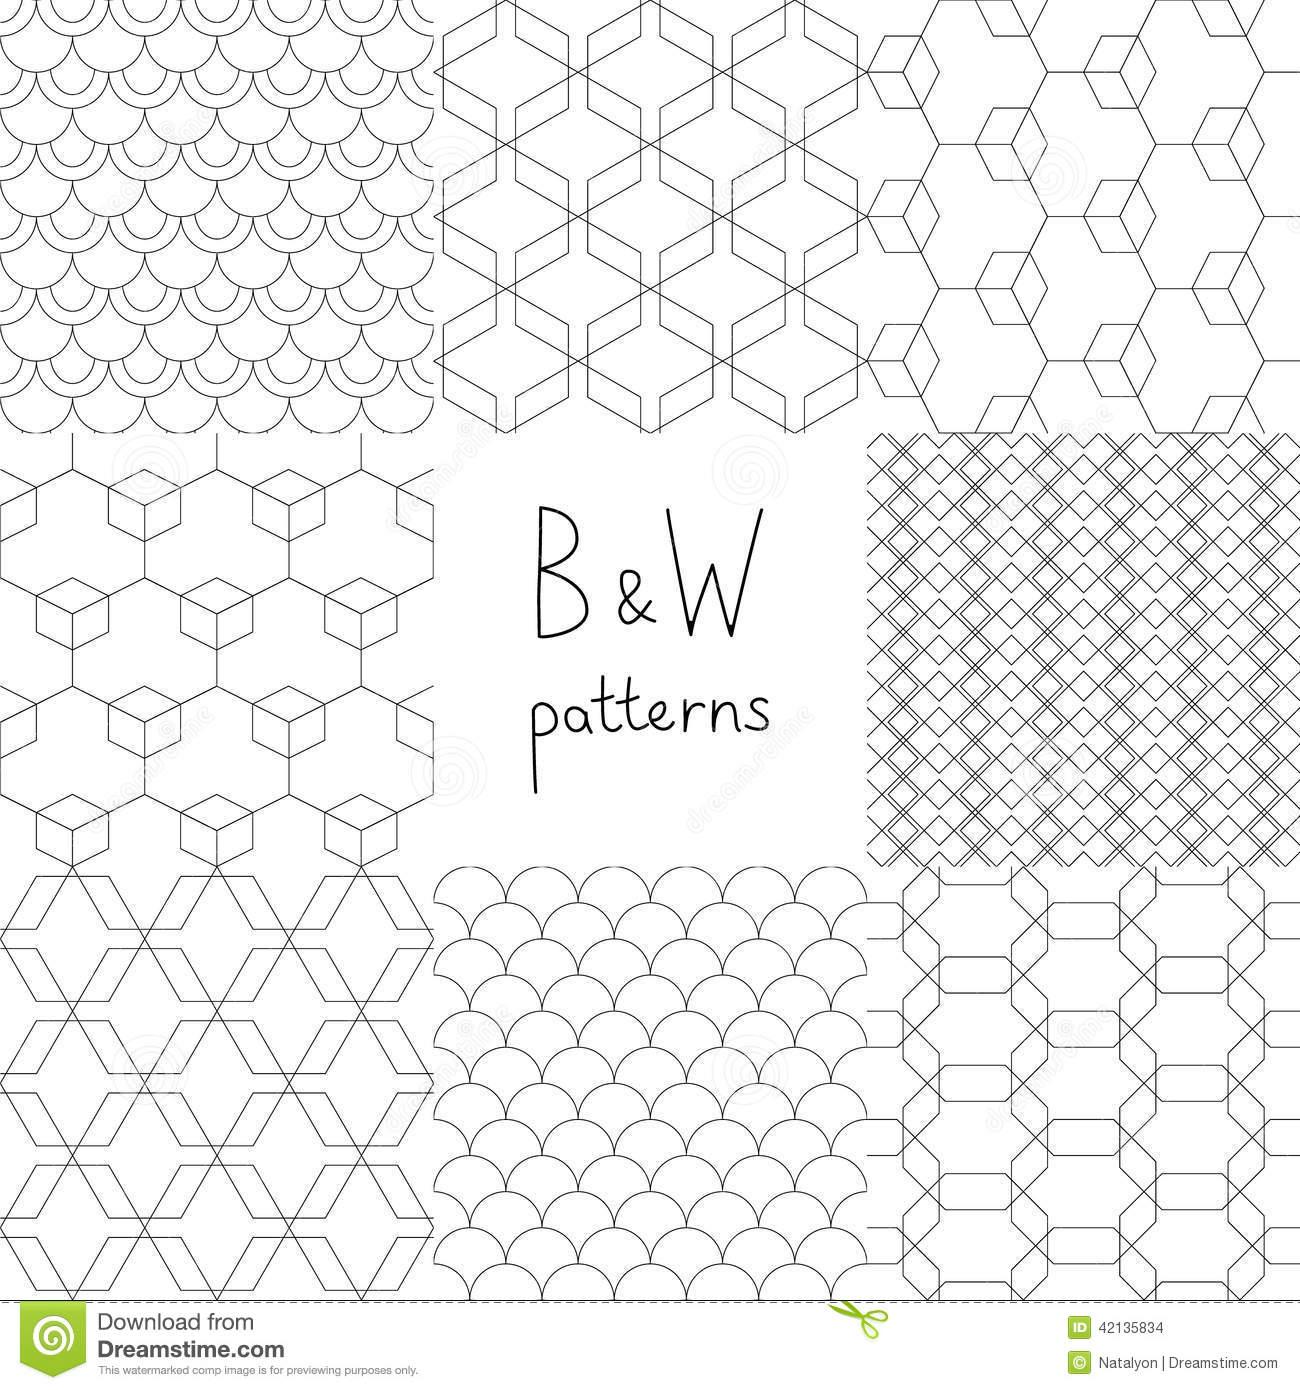 Black and White Simple Geometric Designs